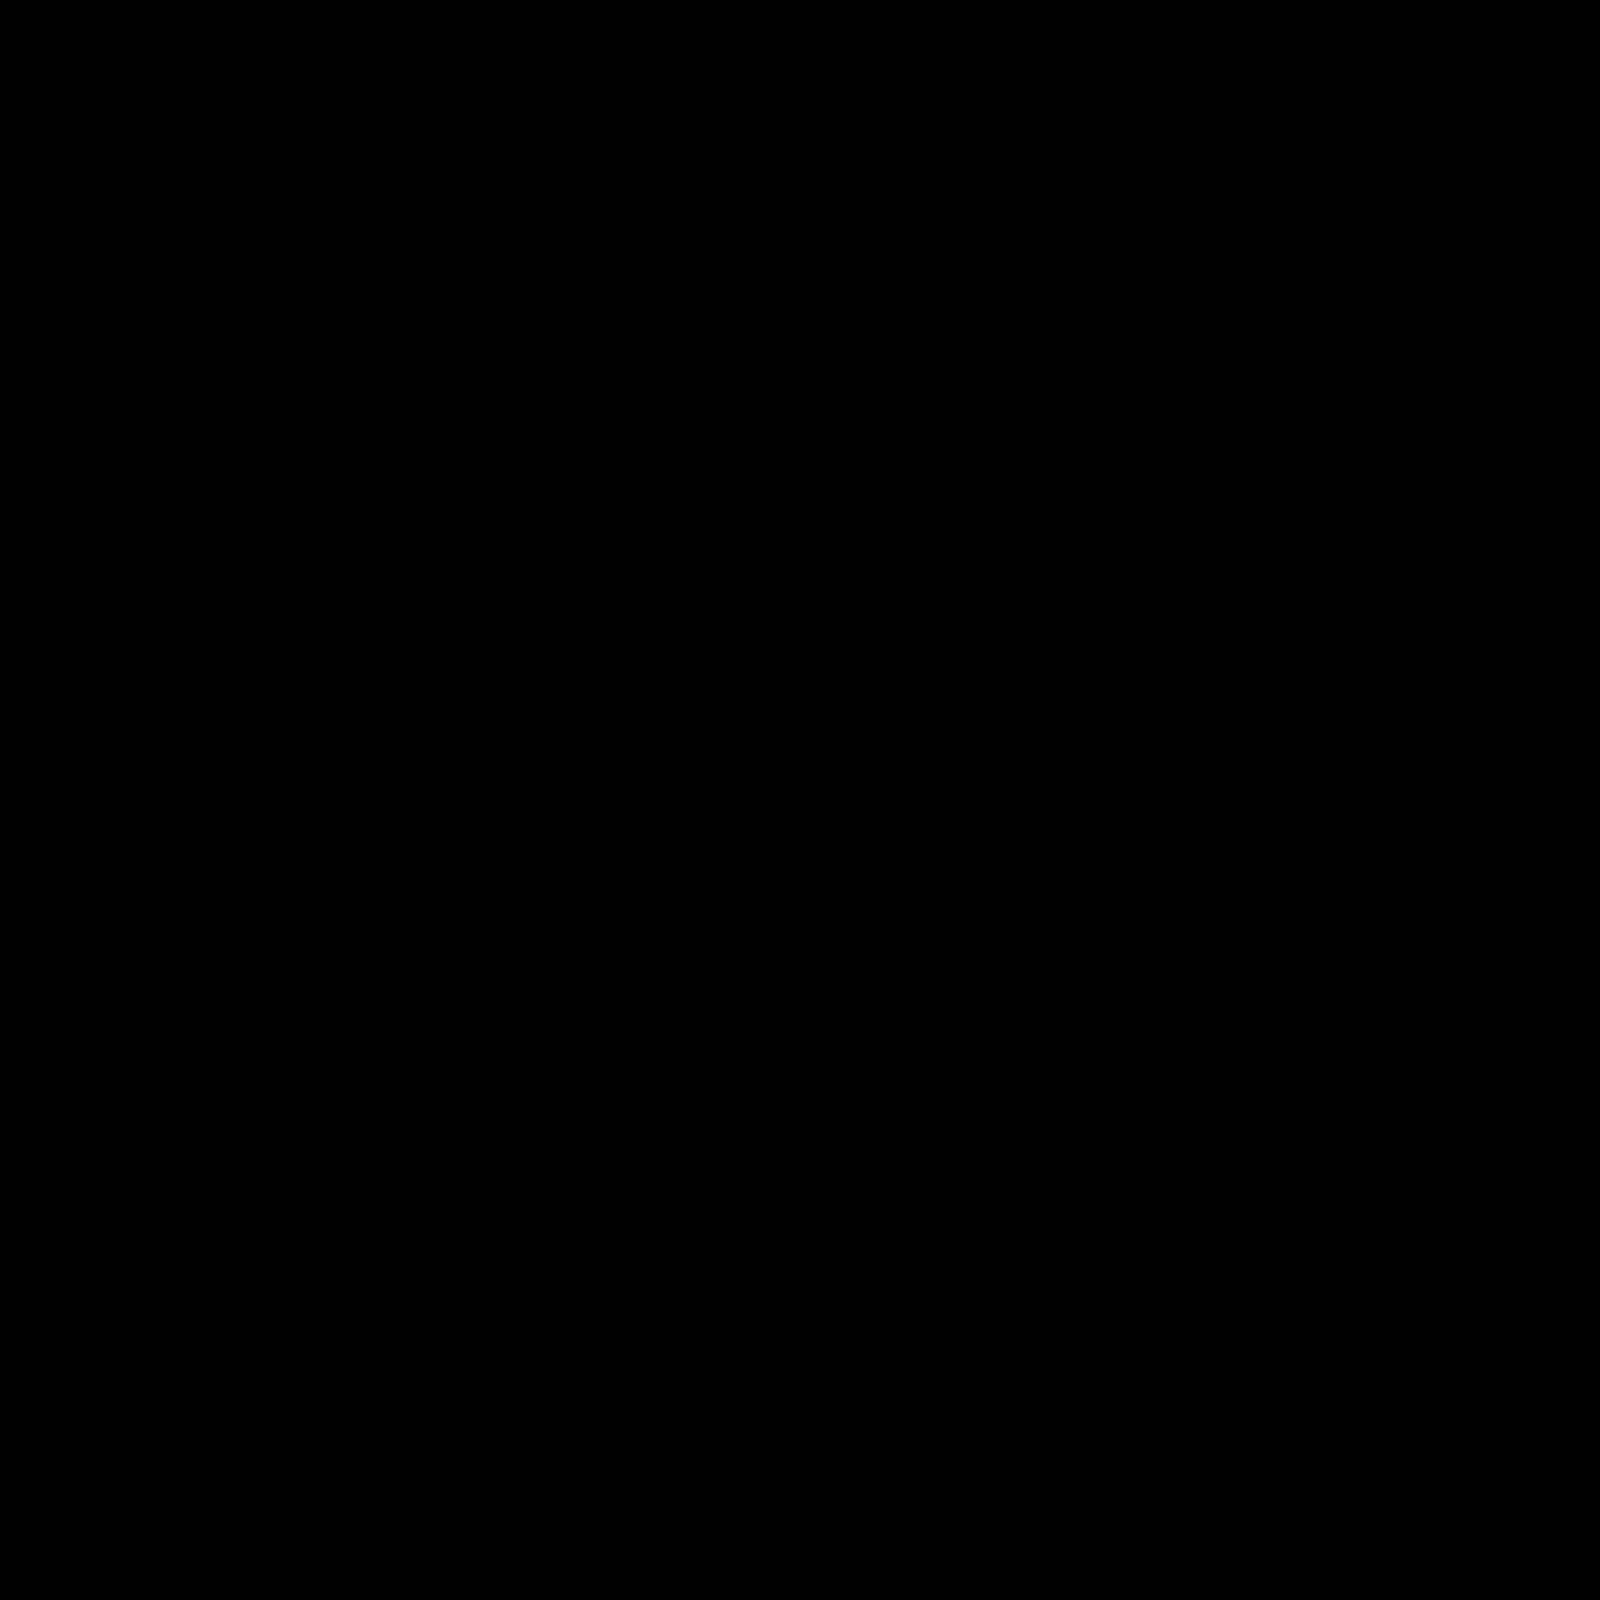 1600x1600 No Chat Icon